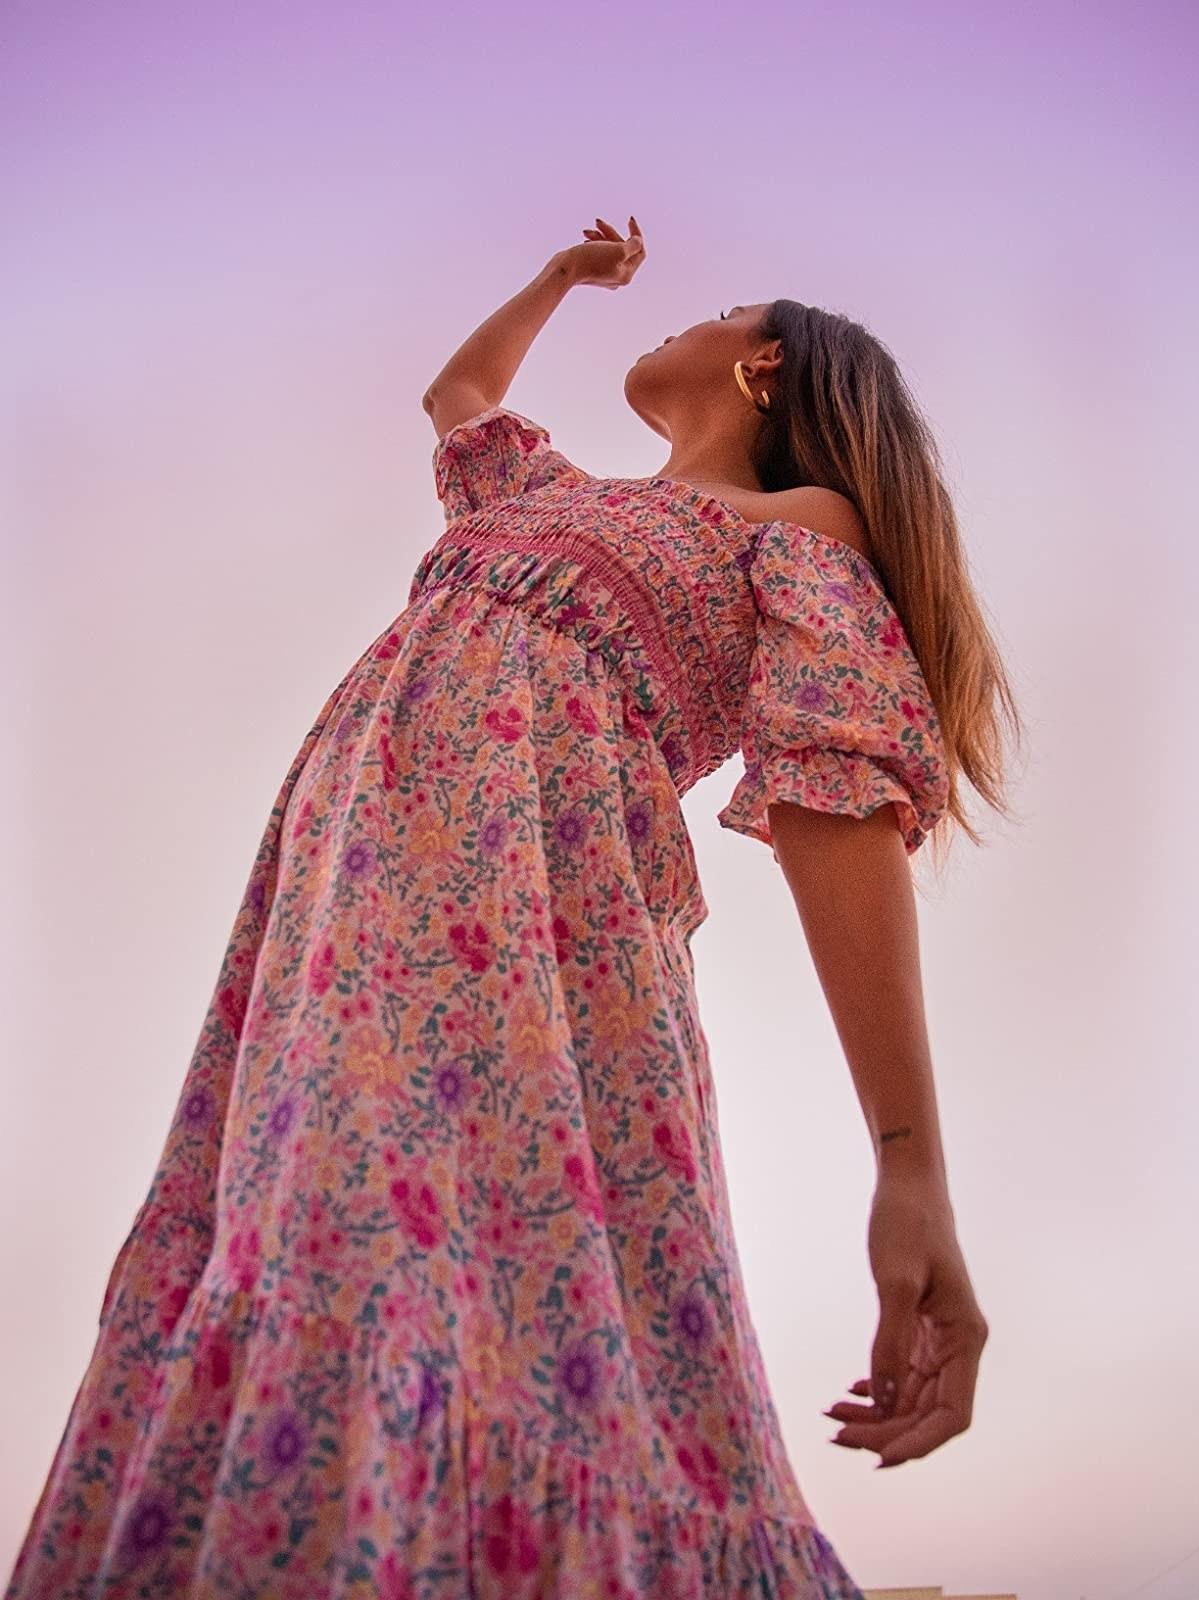 A reviewer wears the dress